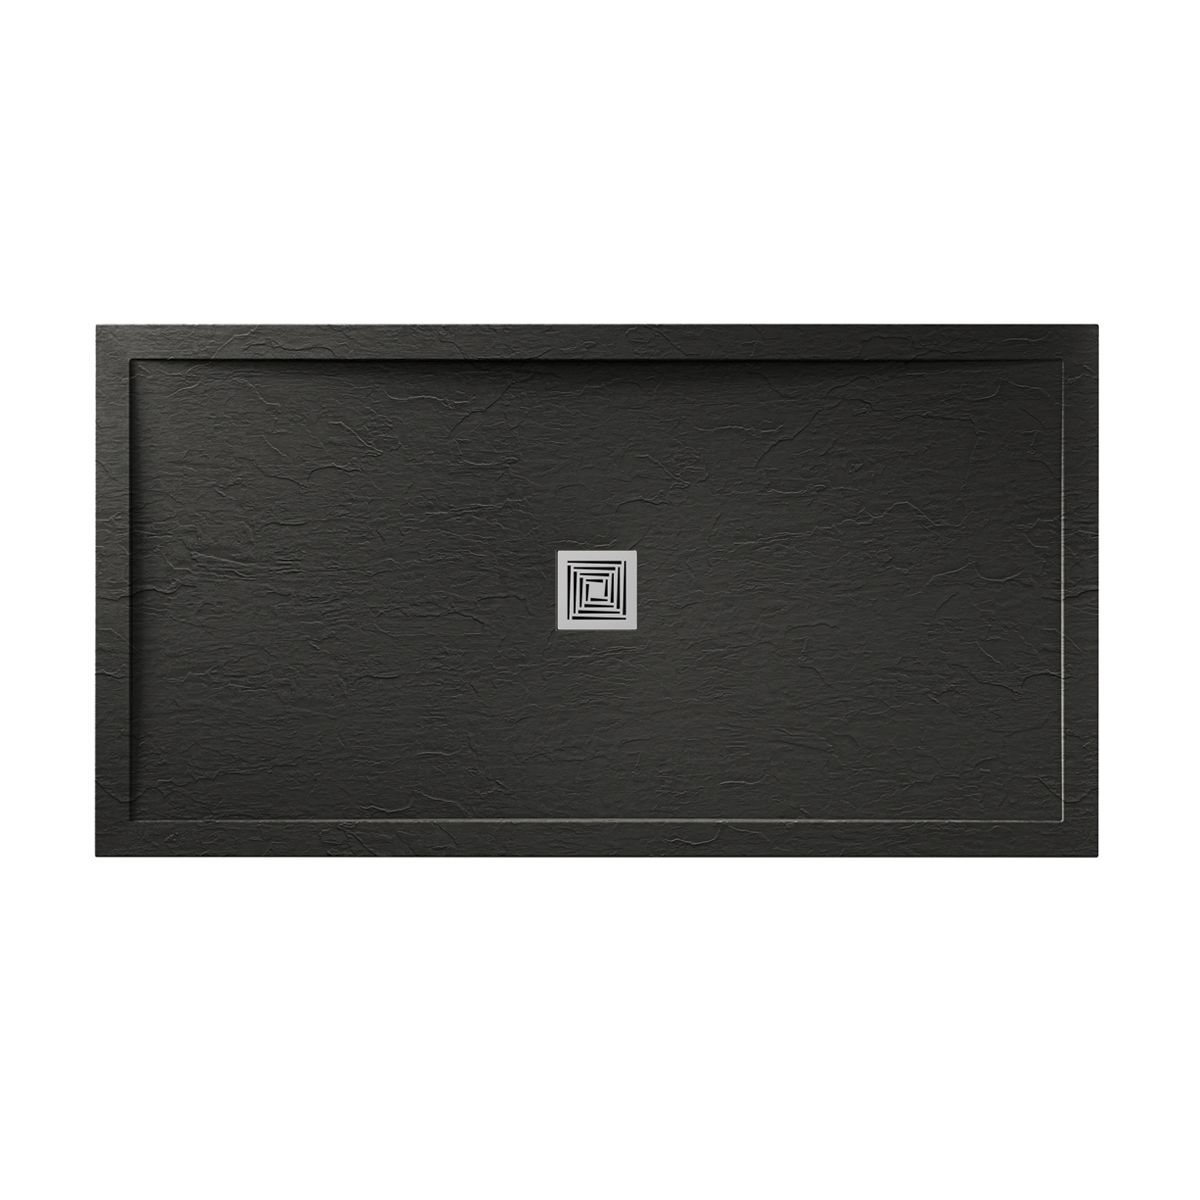 Aquadart Black Slate Shower Tray 1600 x 900